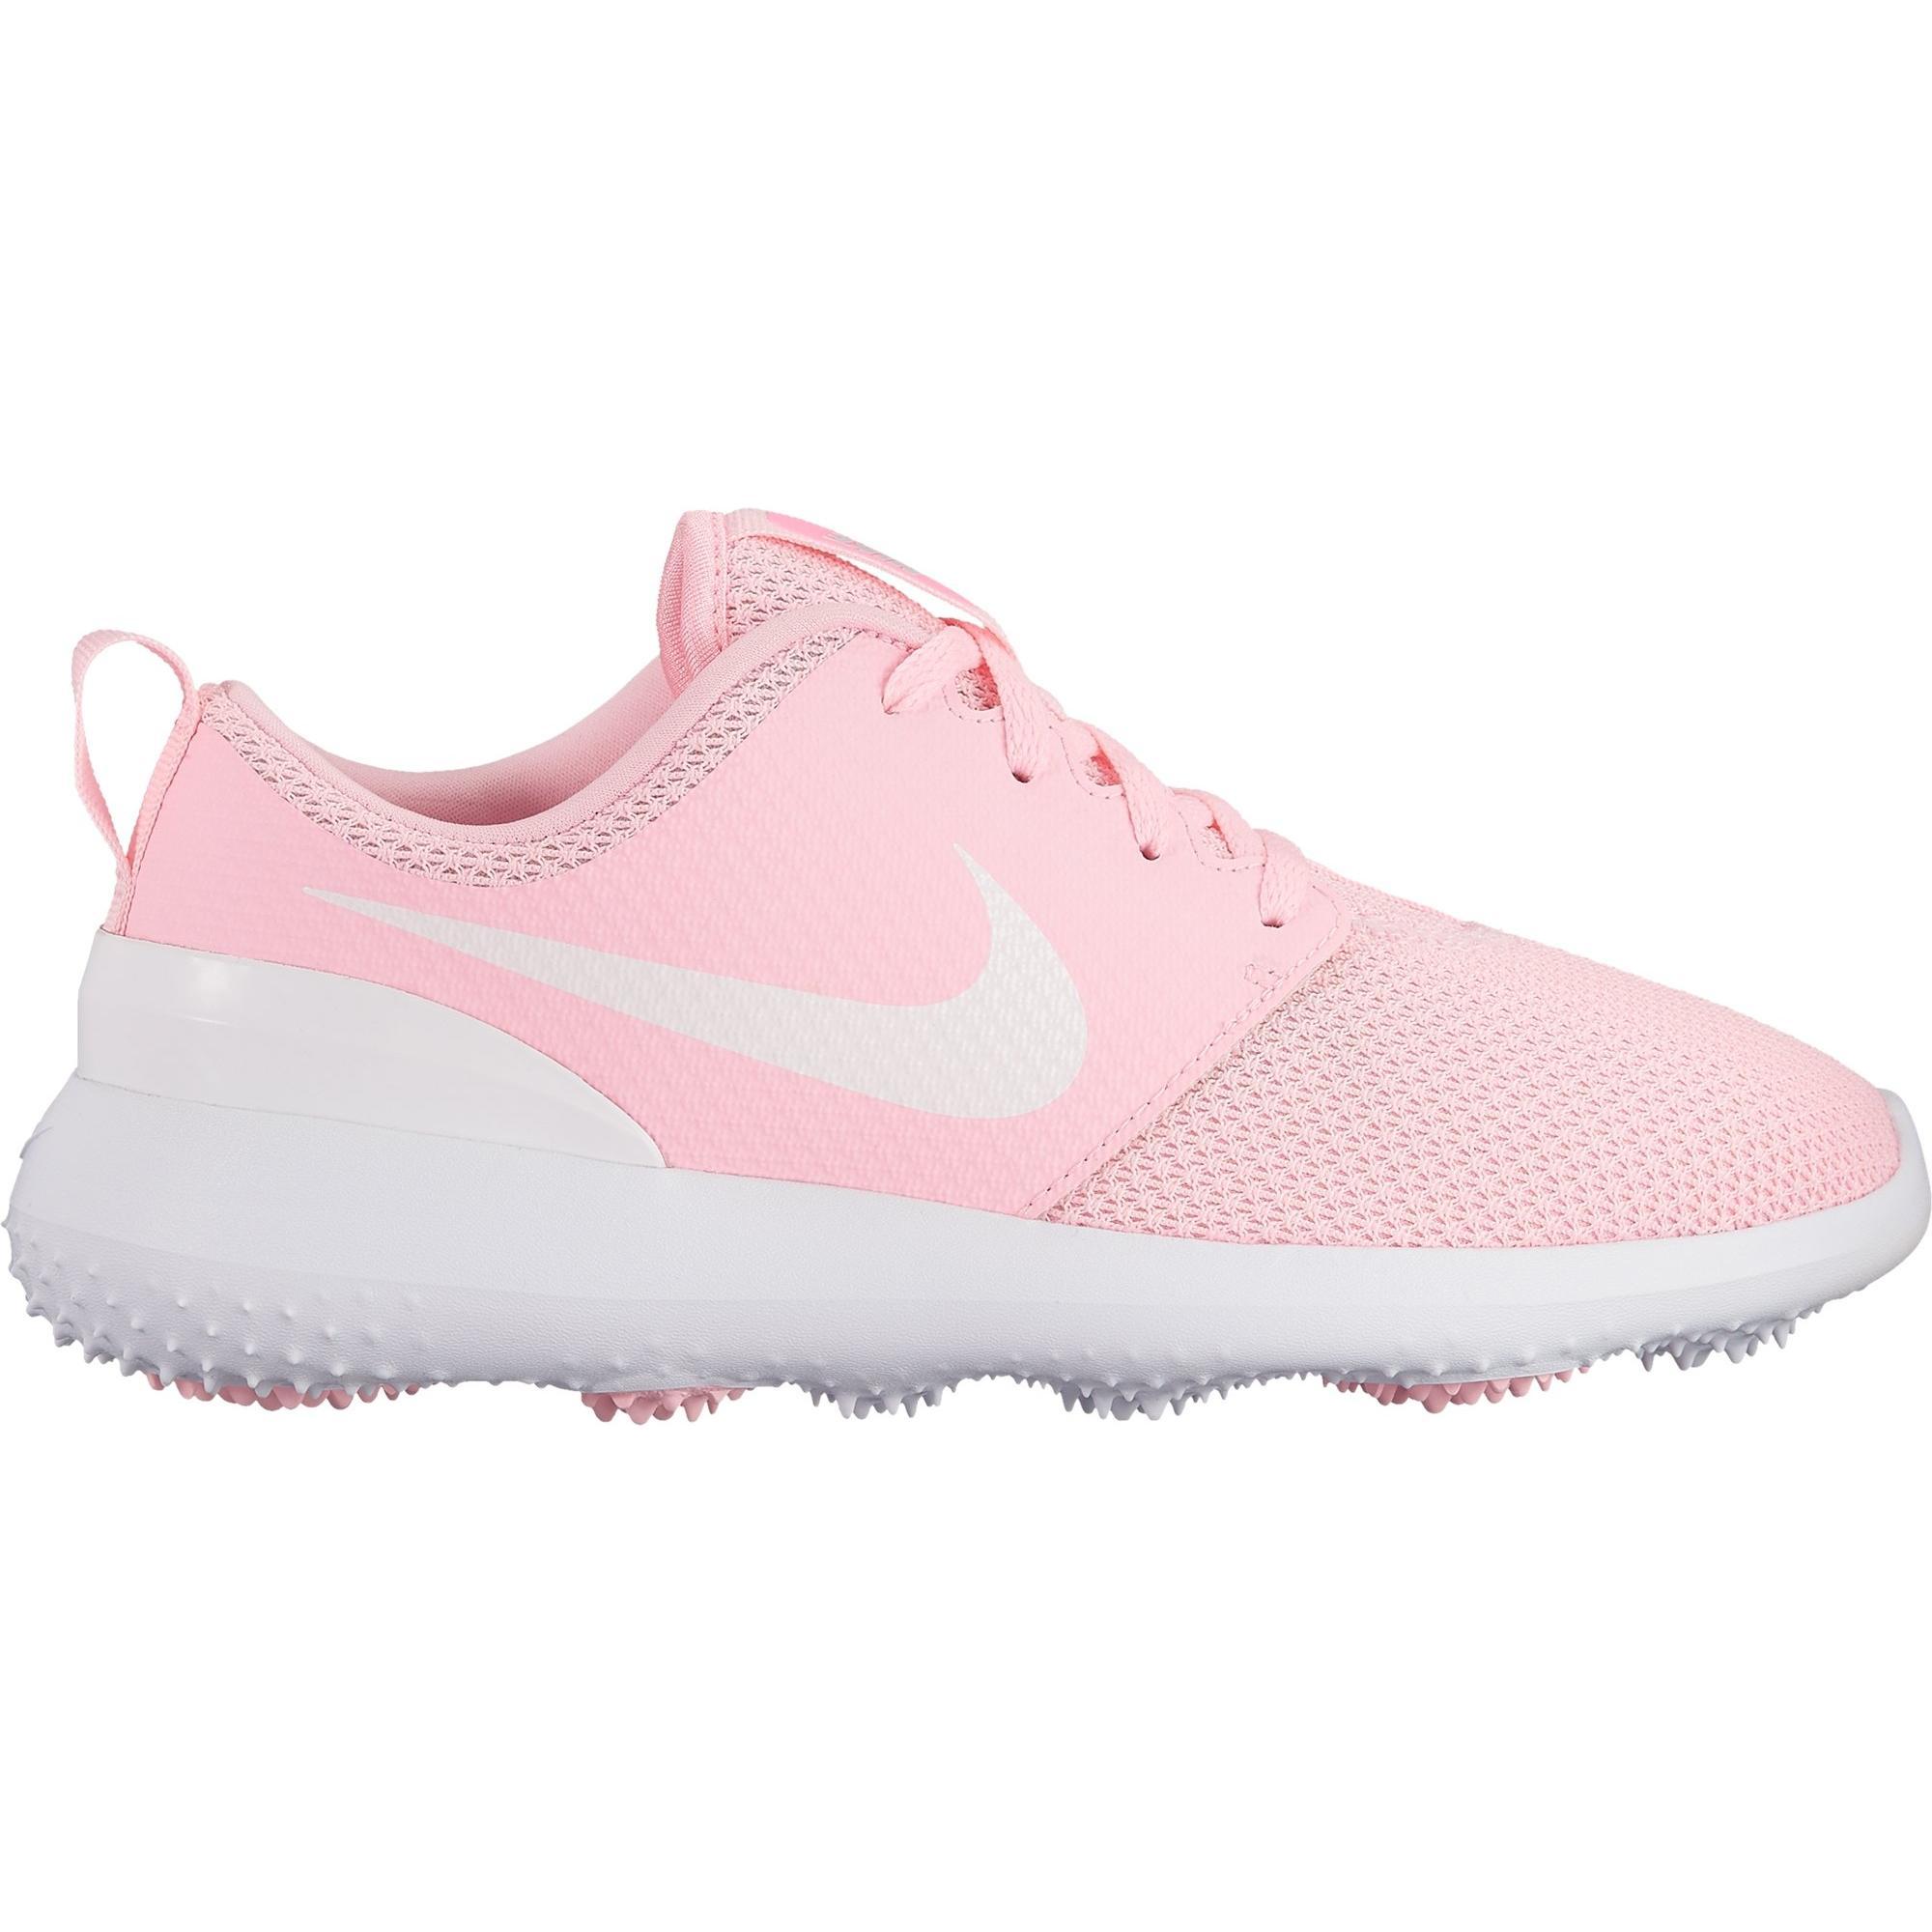 Women's Roshe G Spikeless Golf Shoe - Pink